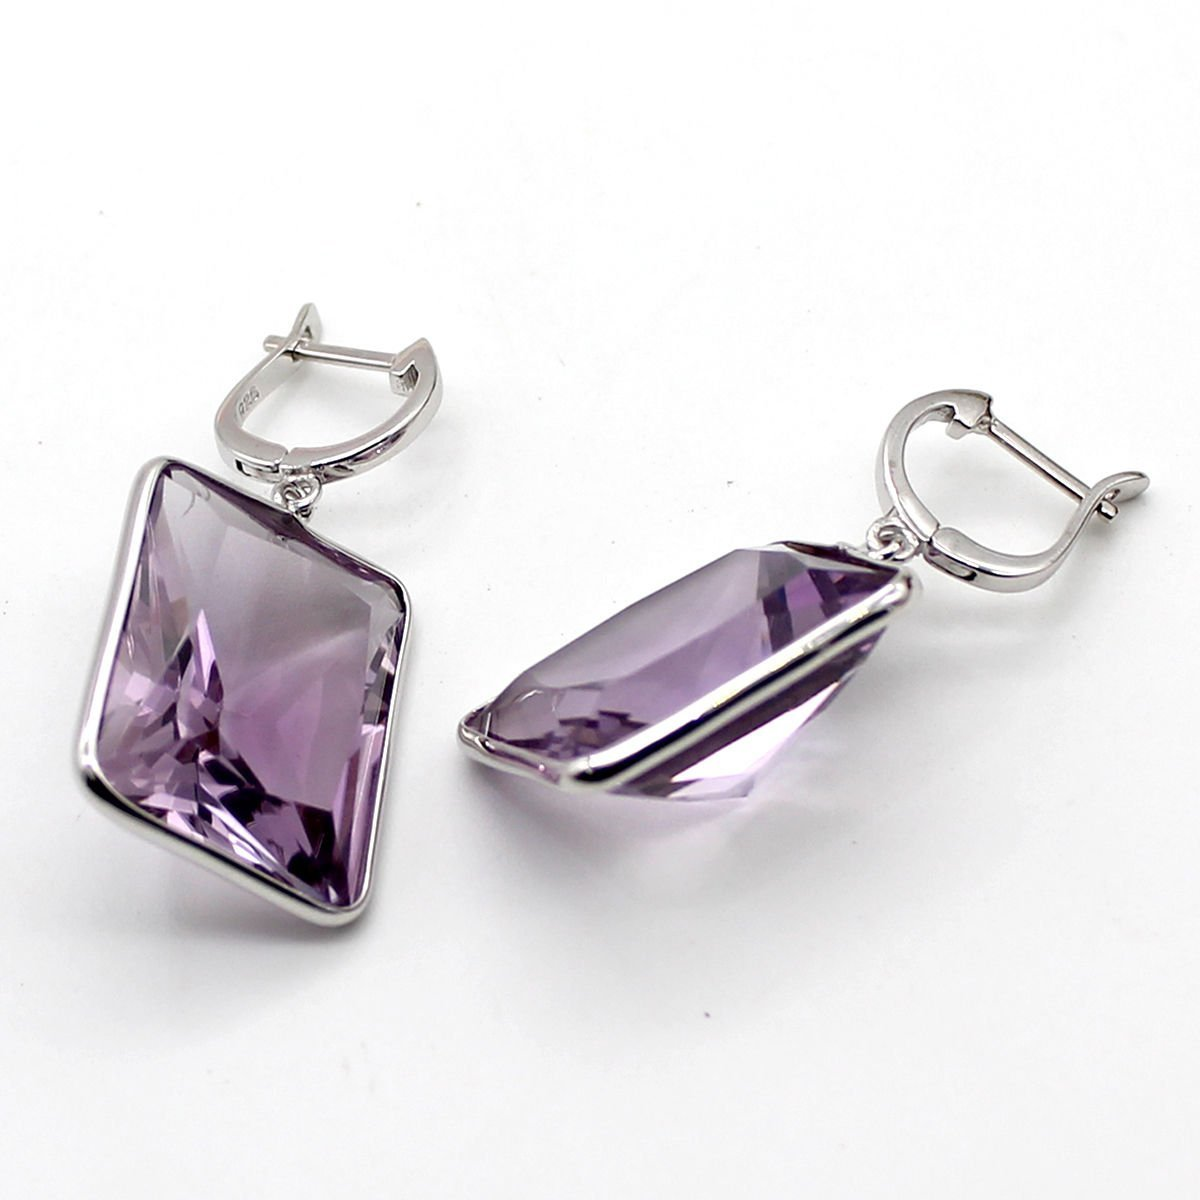 925 Solid Sterling Silver Genuine Amethyst Gemstone Handcrafted Women's Drop Ear